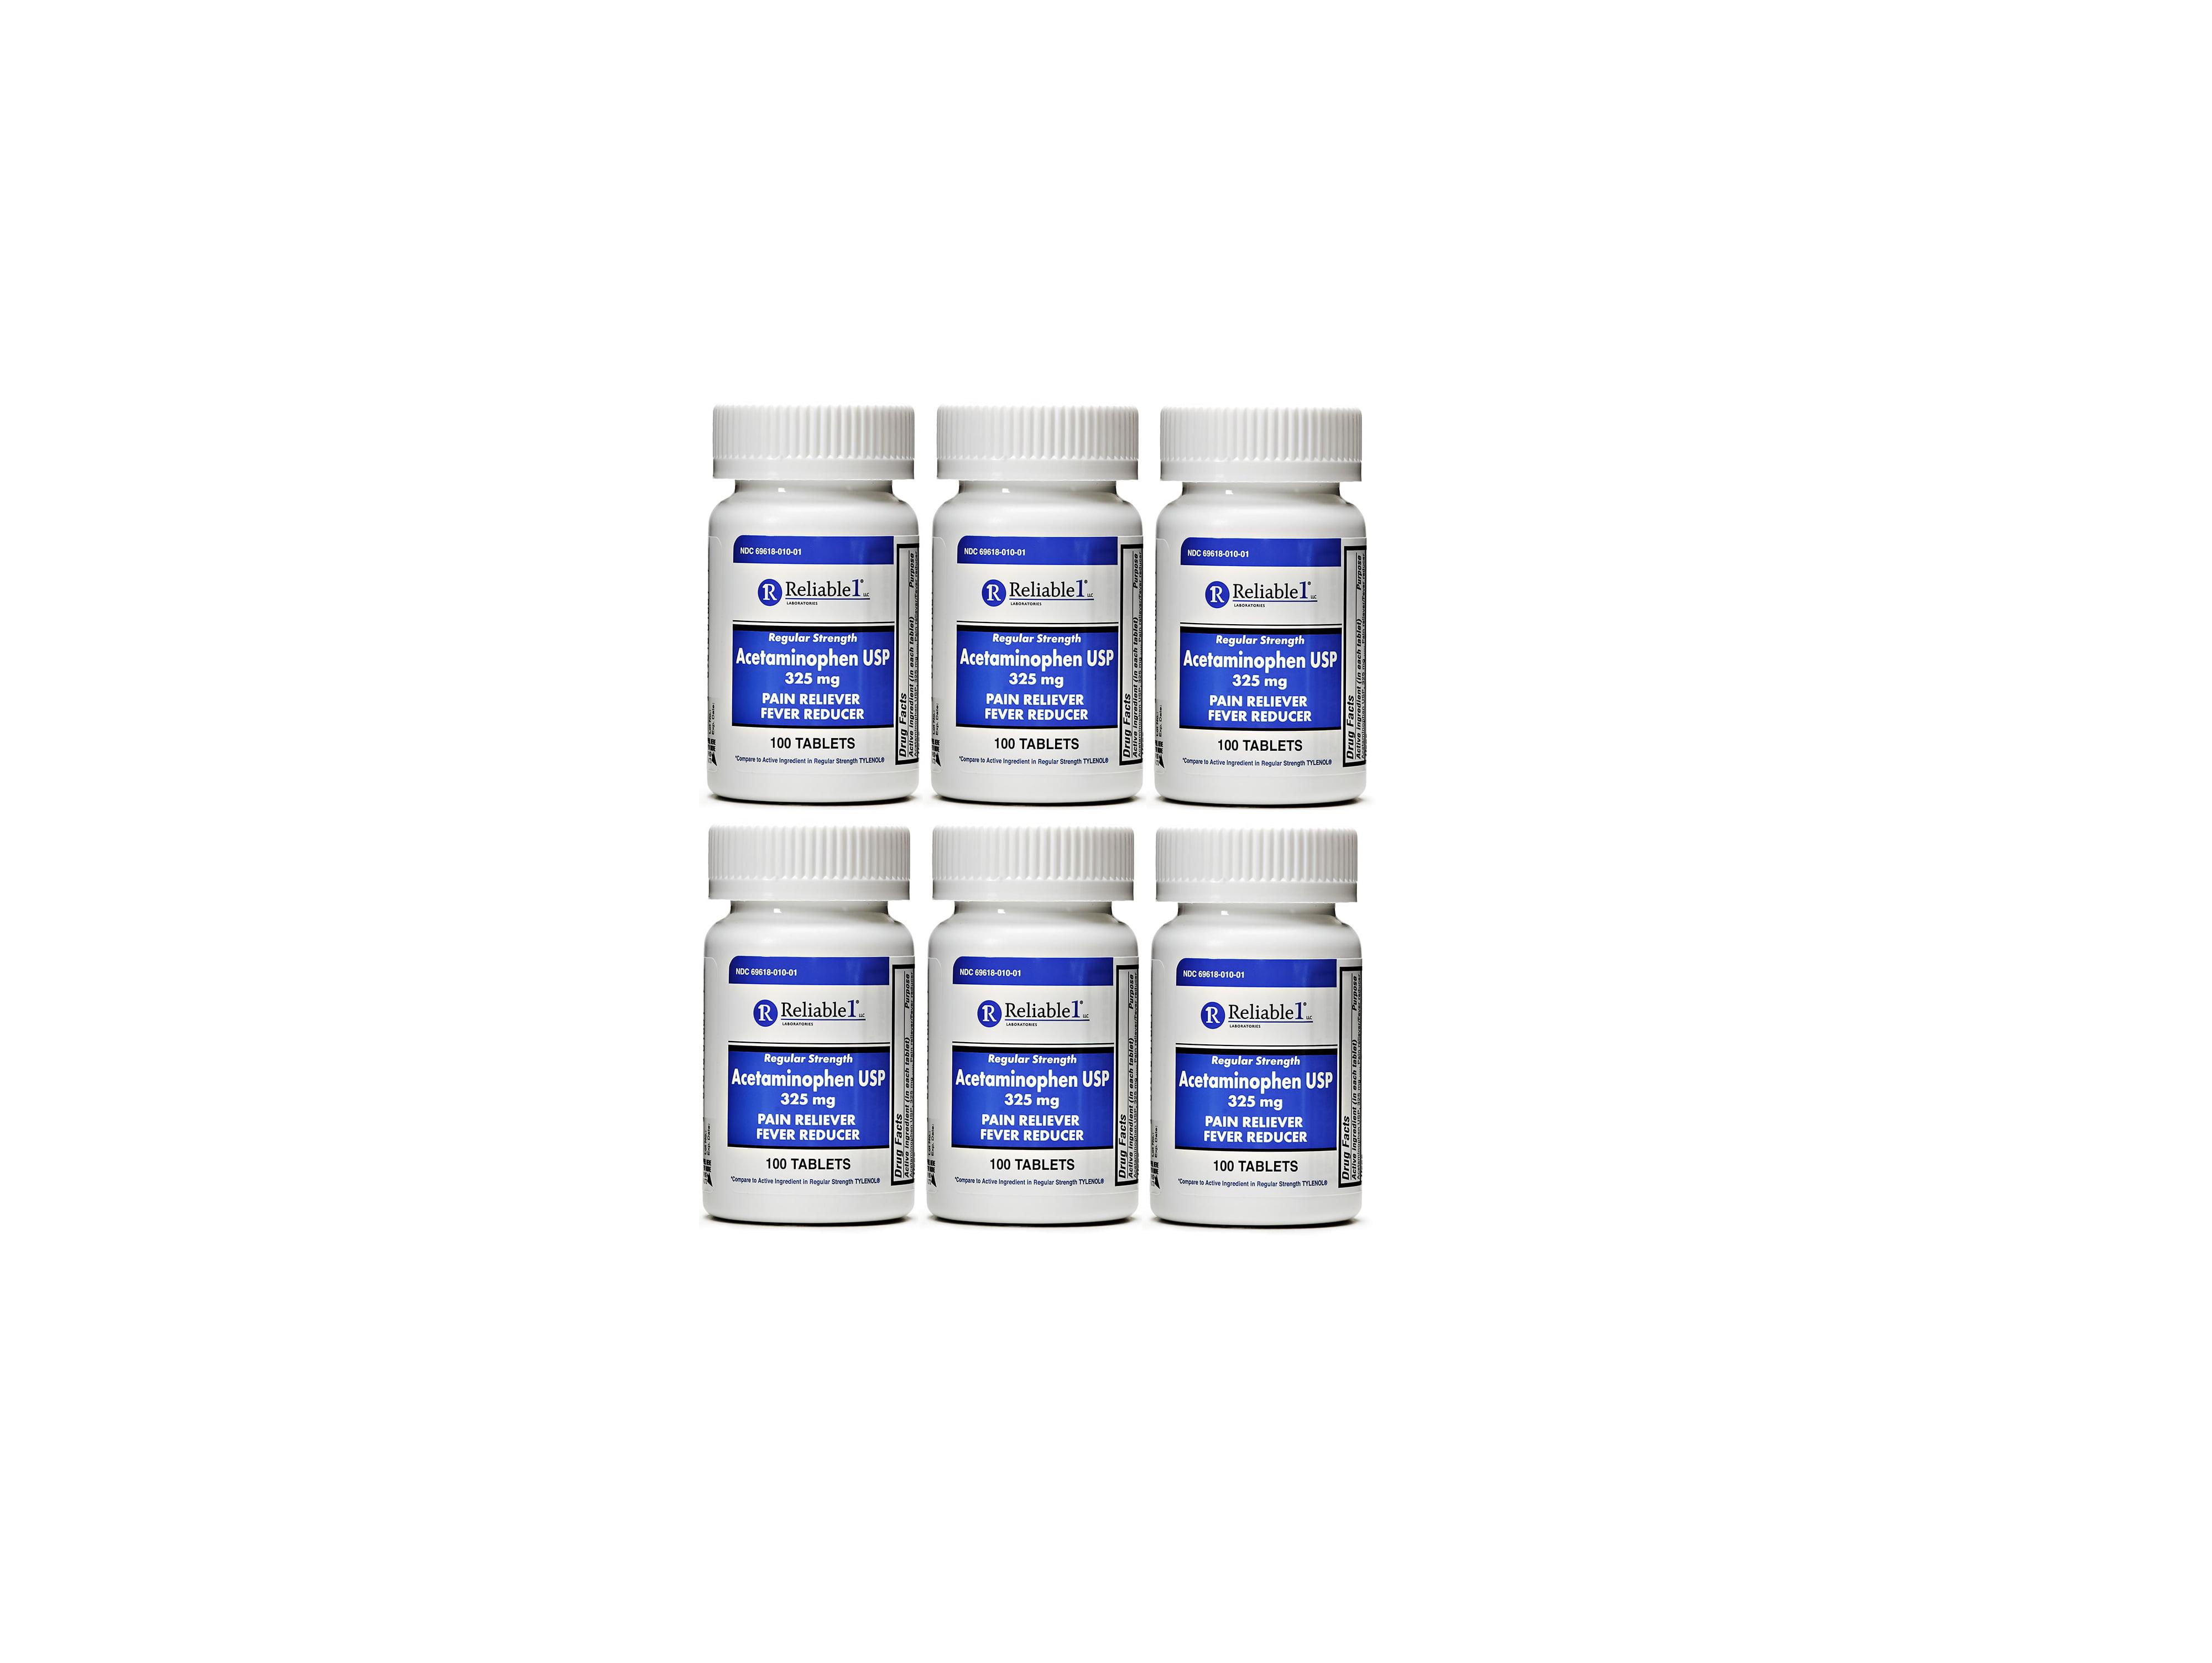 Diphenhydramine 25 mg Generic Benadryl Allergy Medicine and Antihistamine  100 Capsules per Bottle PACK of 6